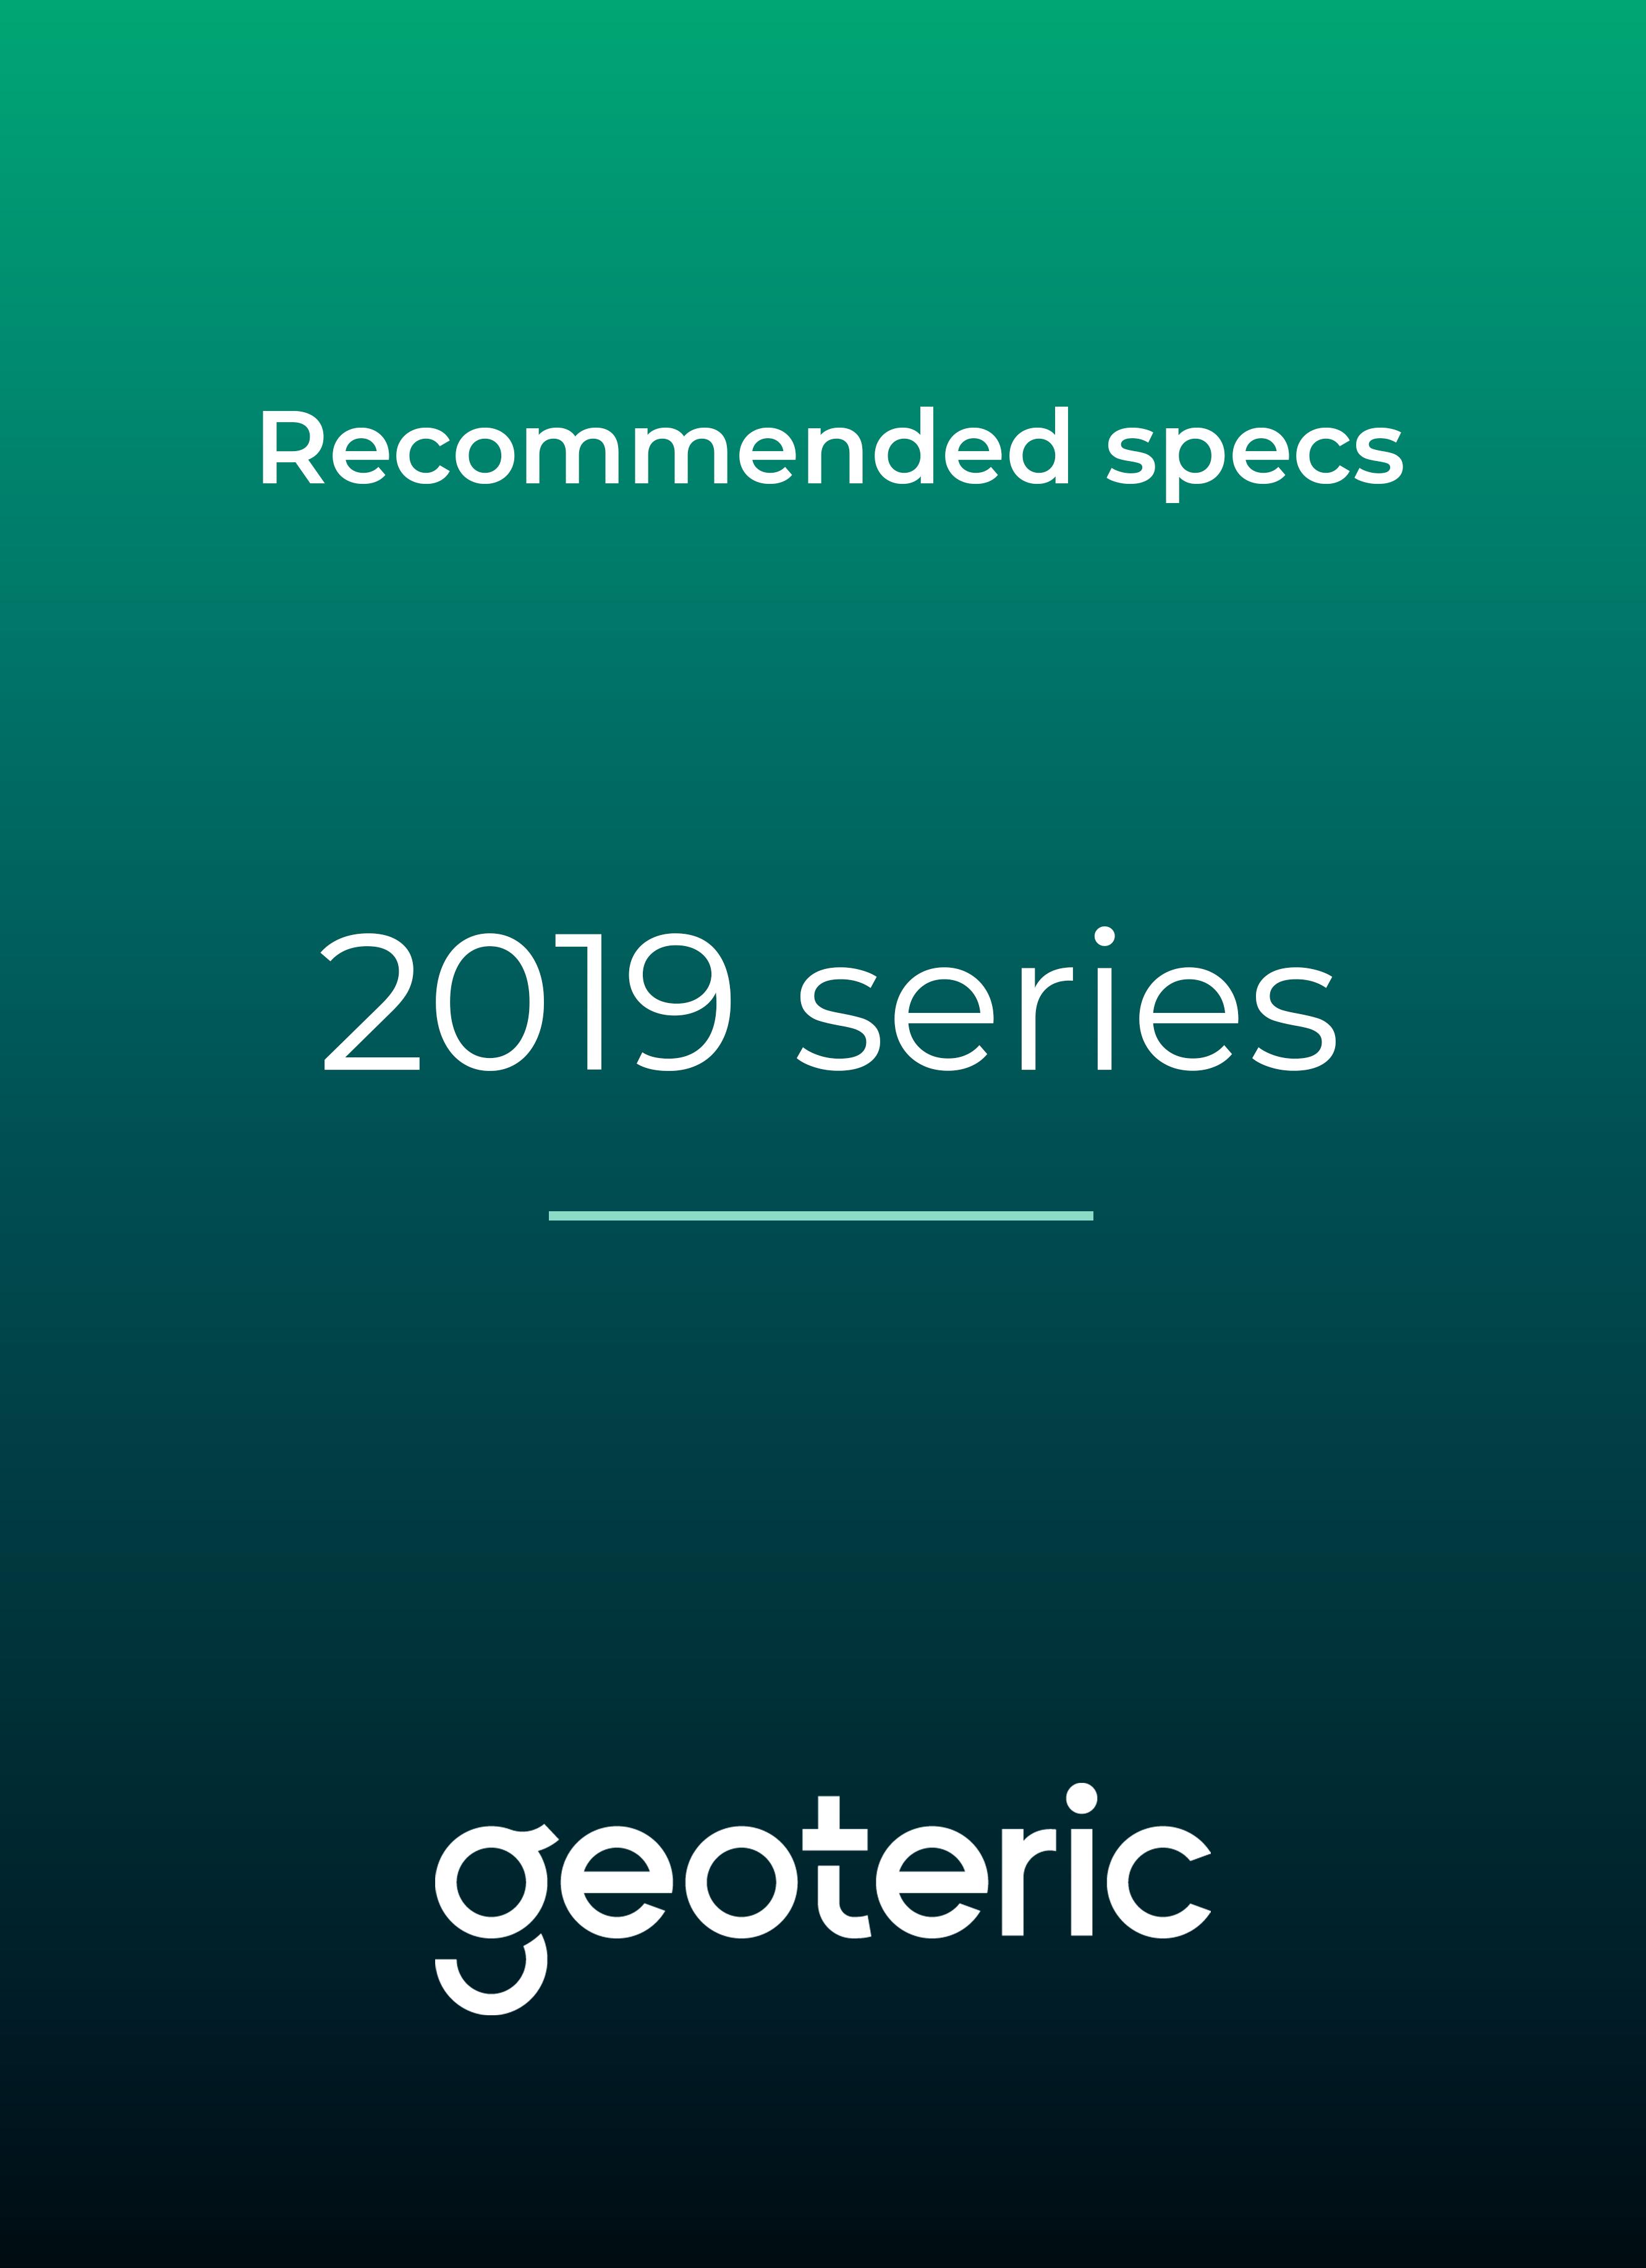 2019-series-user-guide-1-1